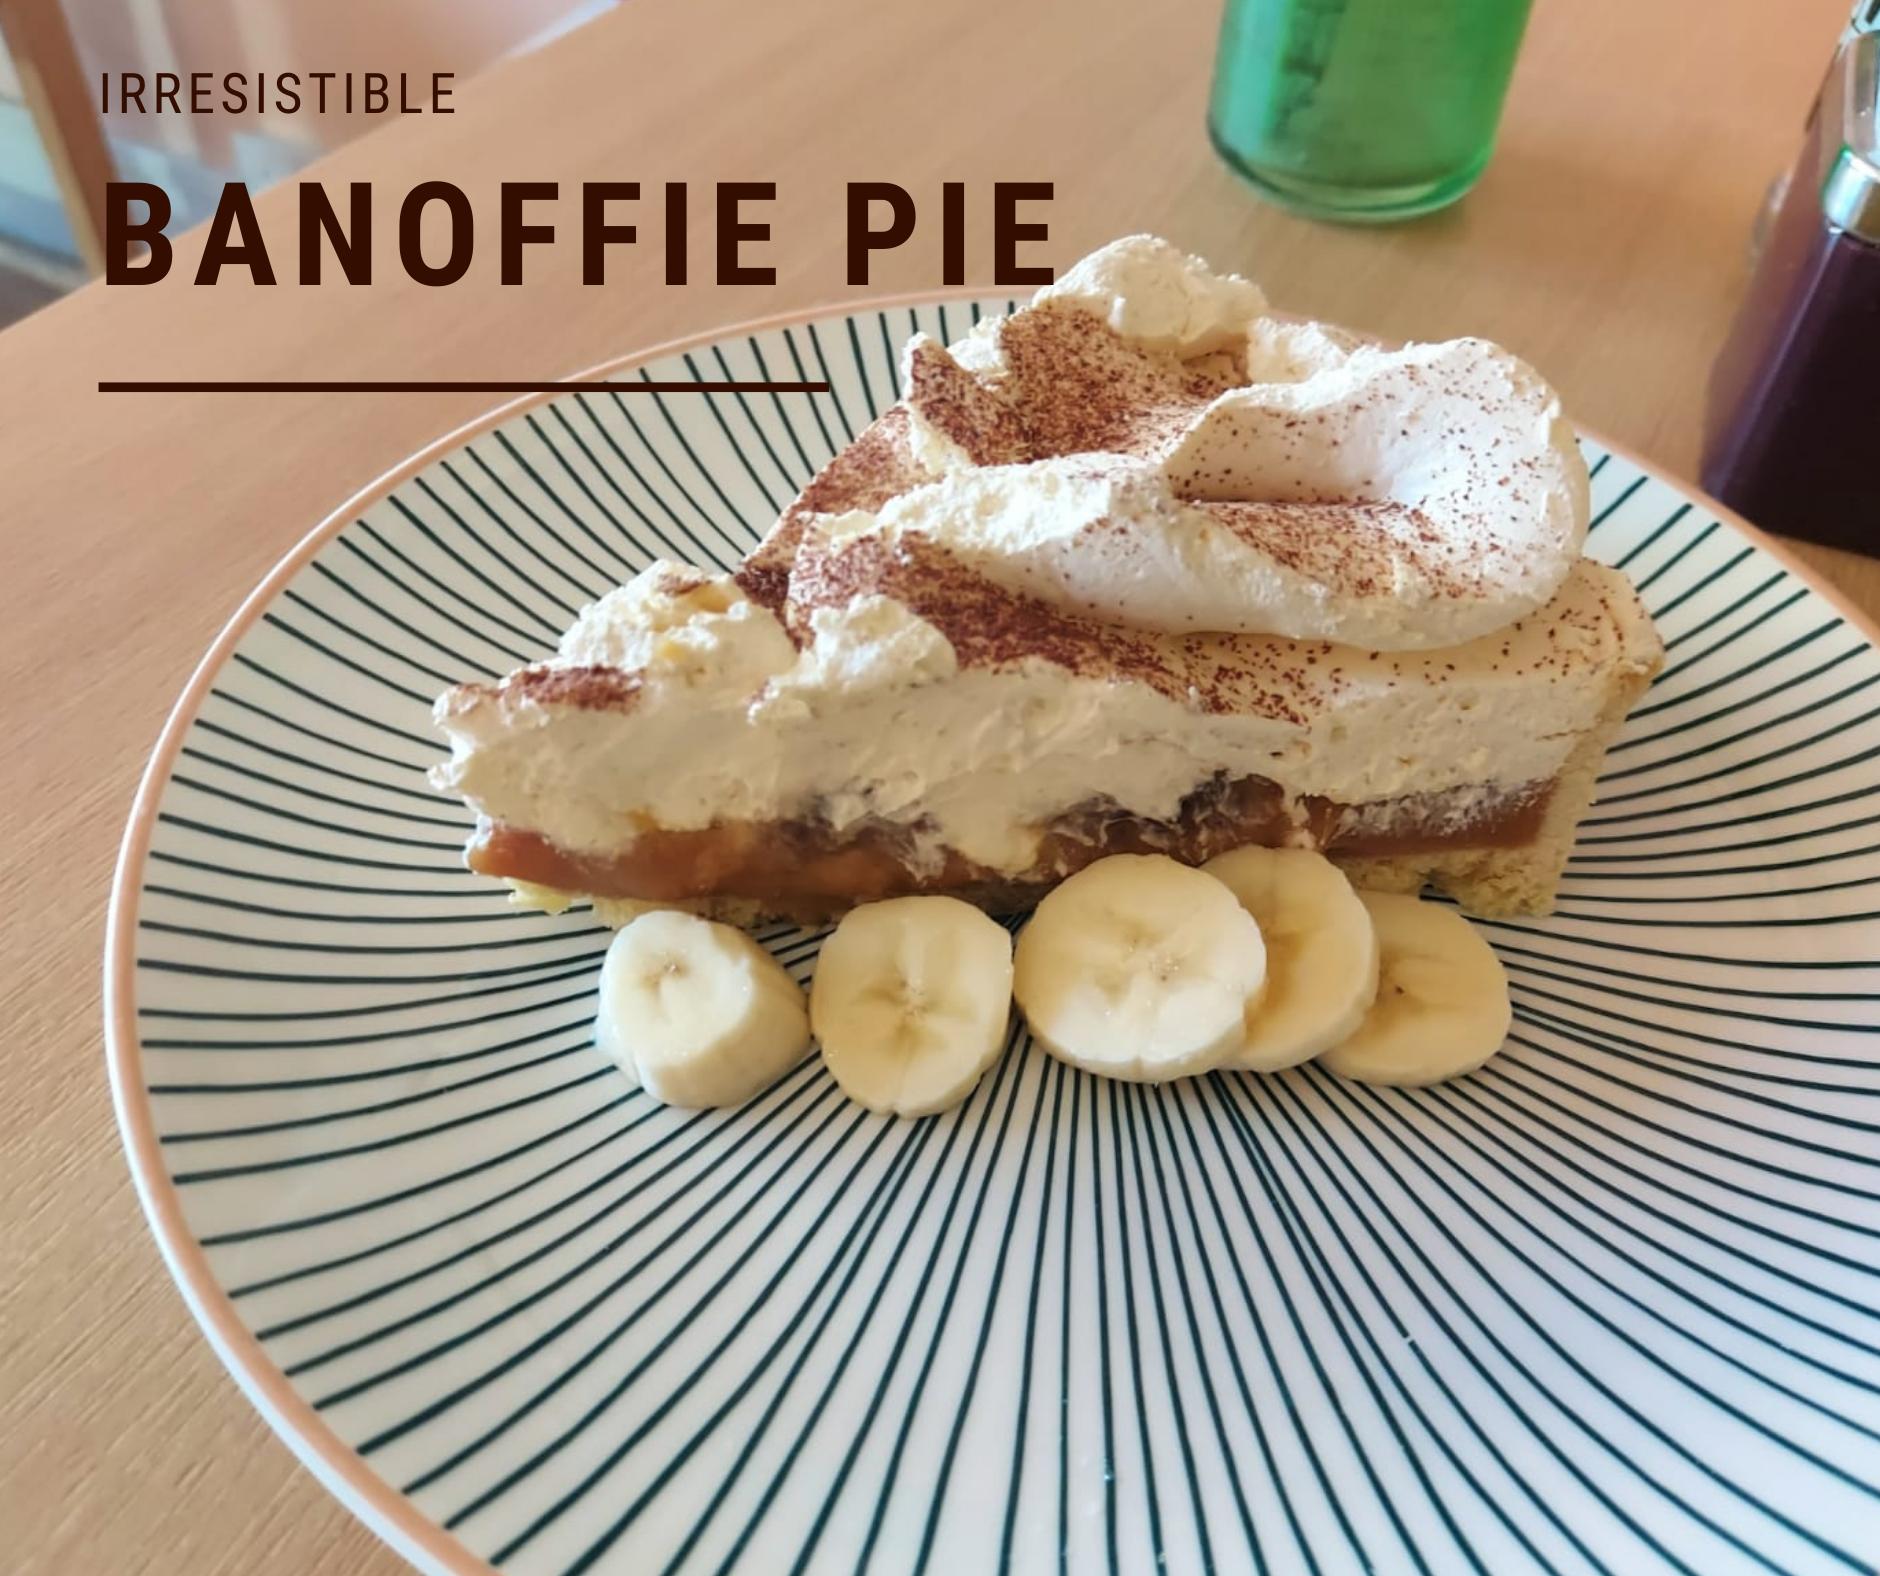 Banoffie pie cake